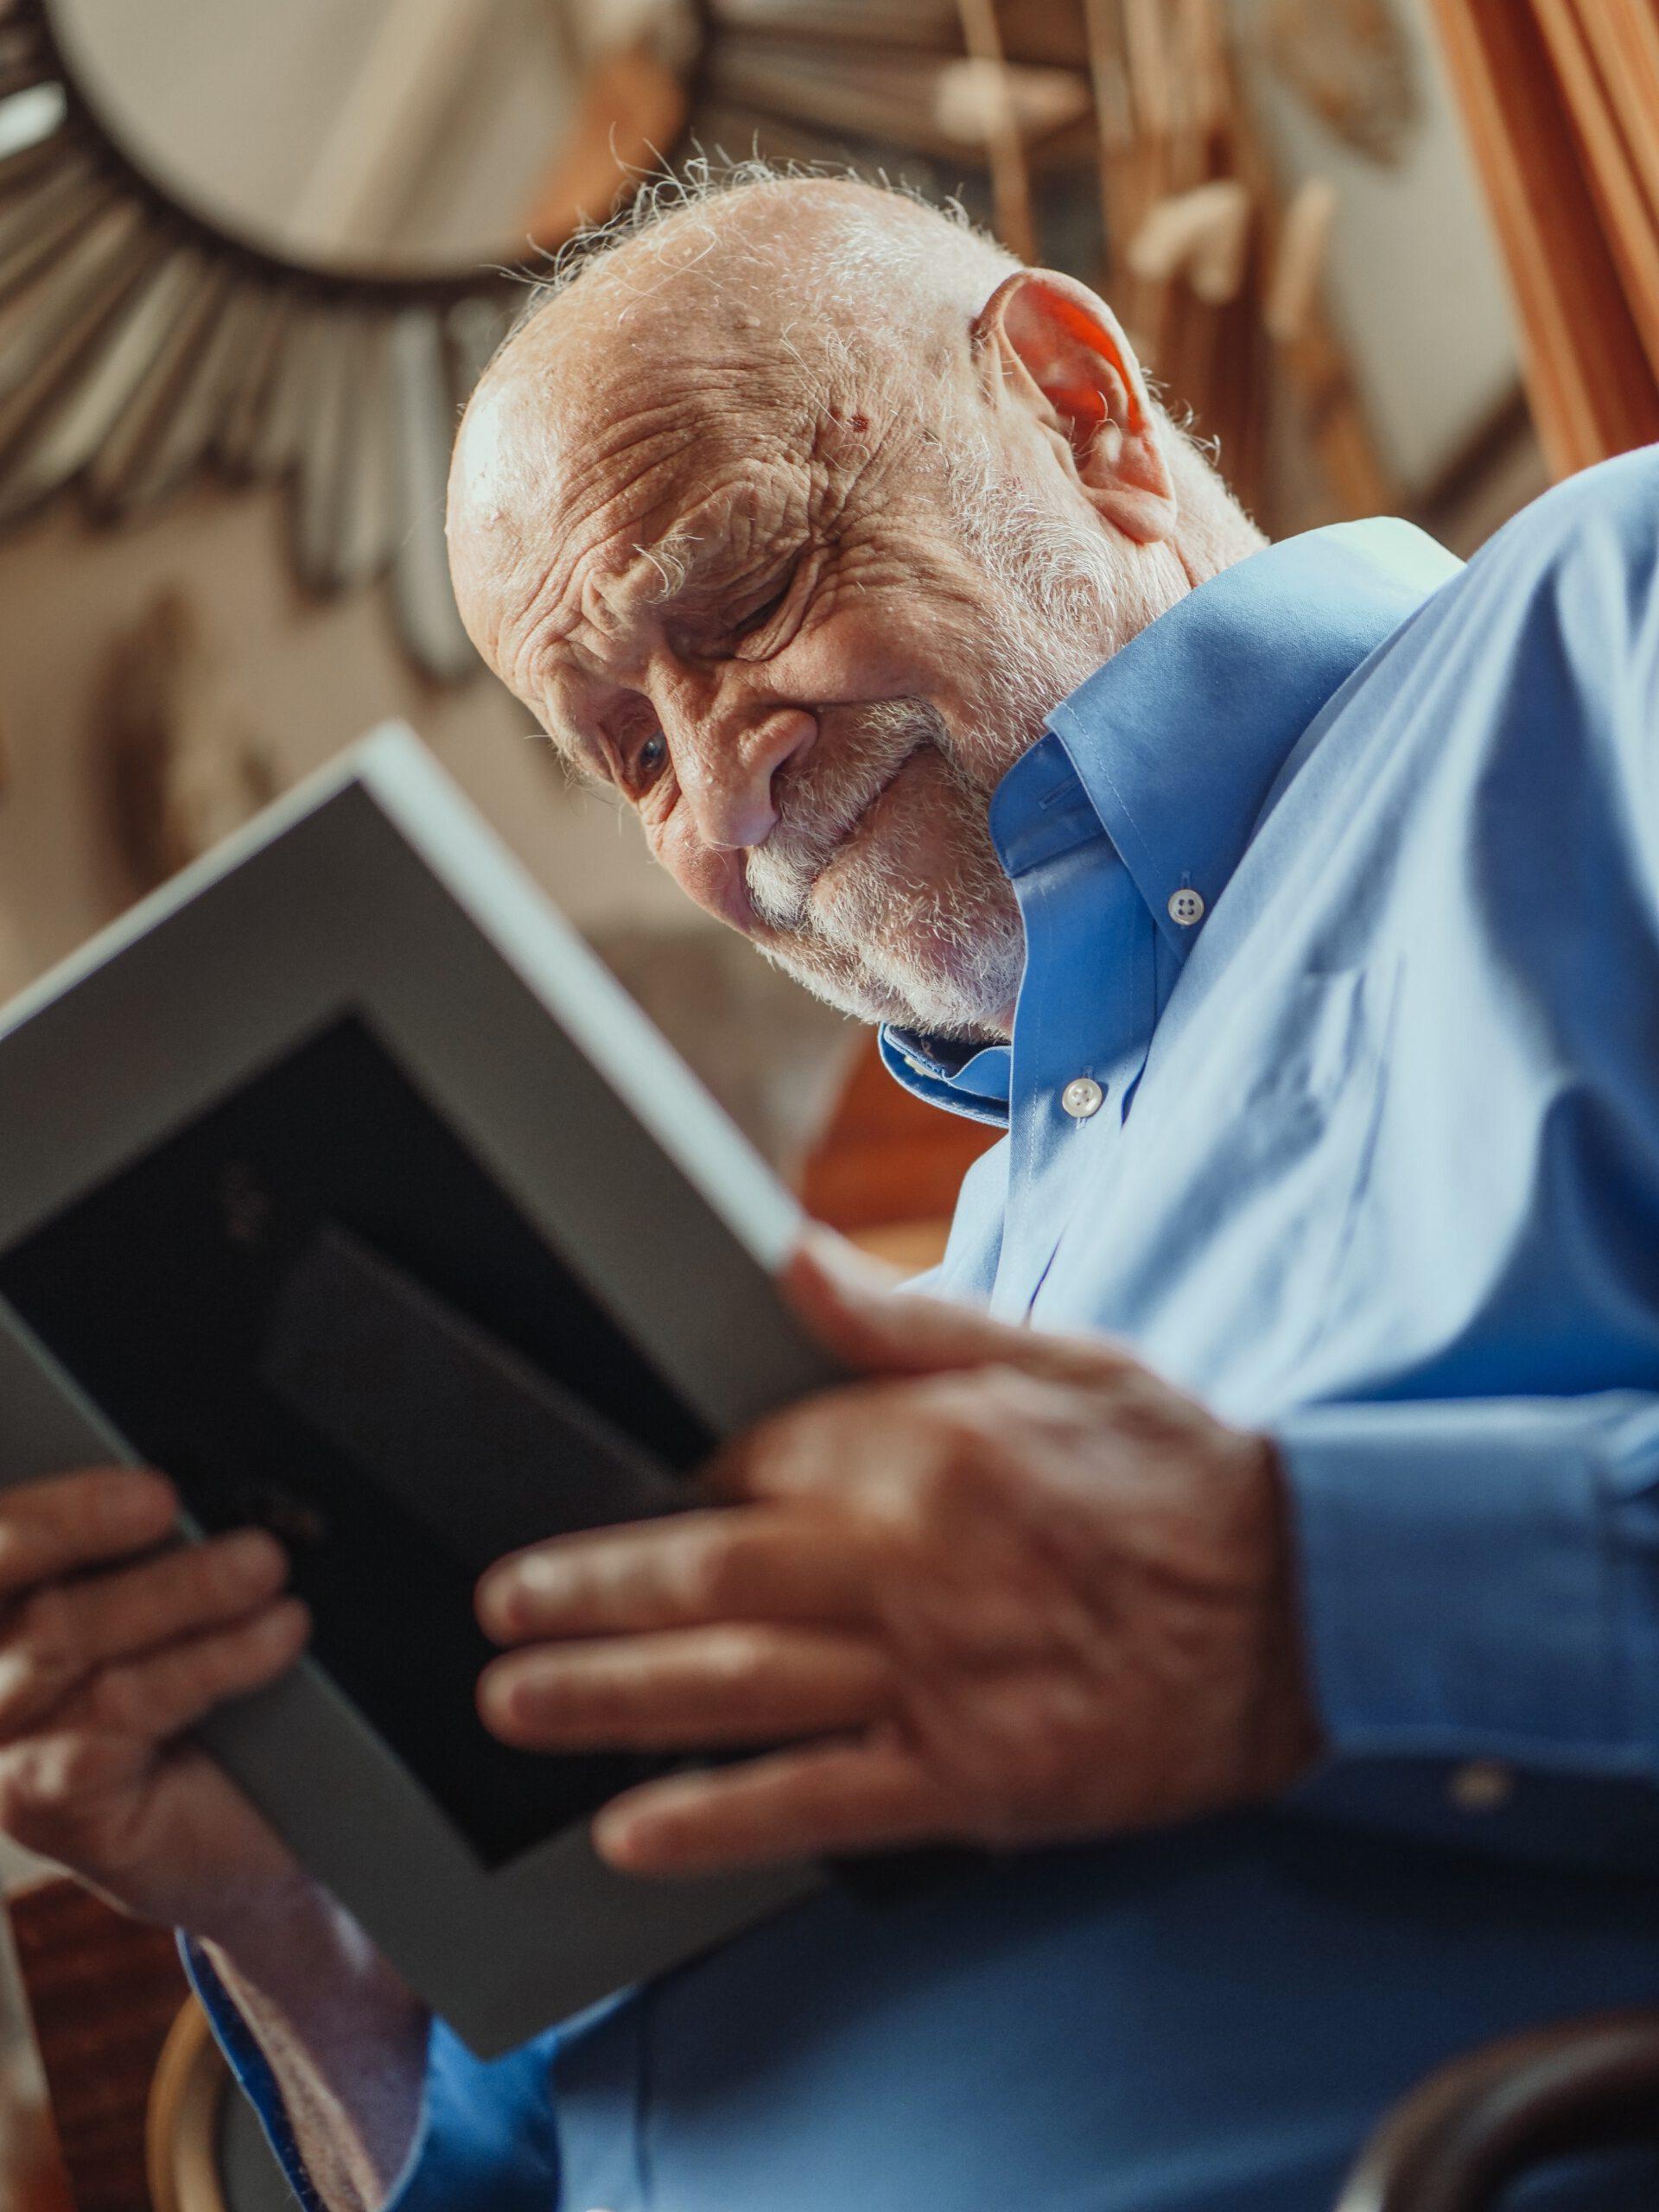 cómo saber si mi familiar tiene alzheimer